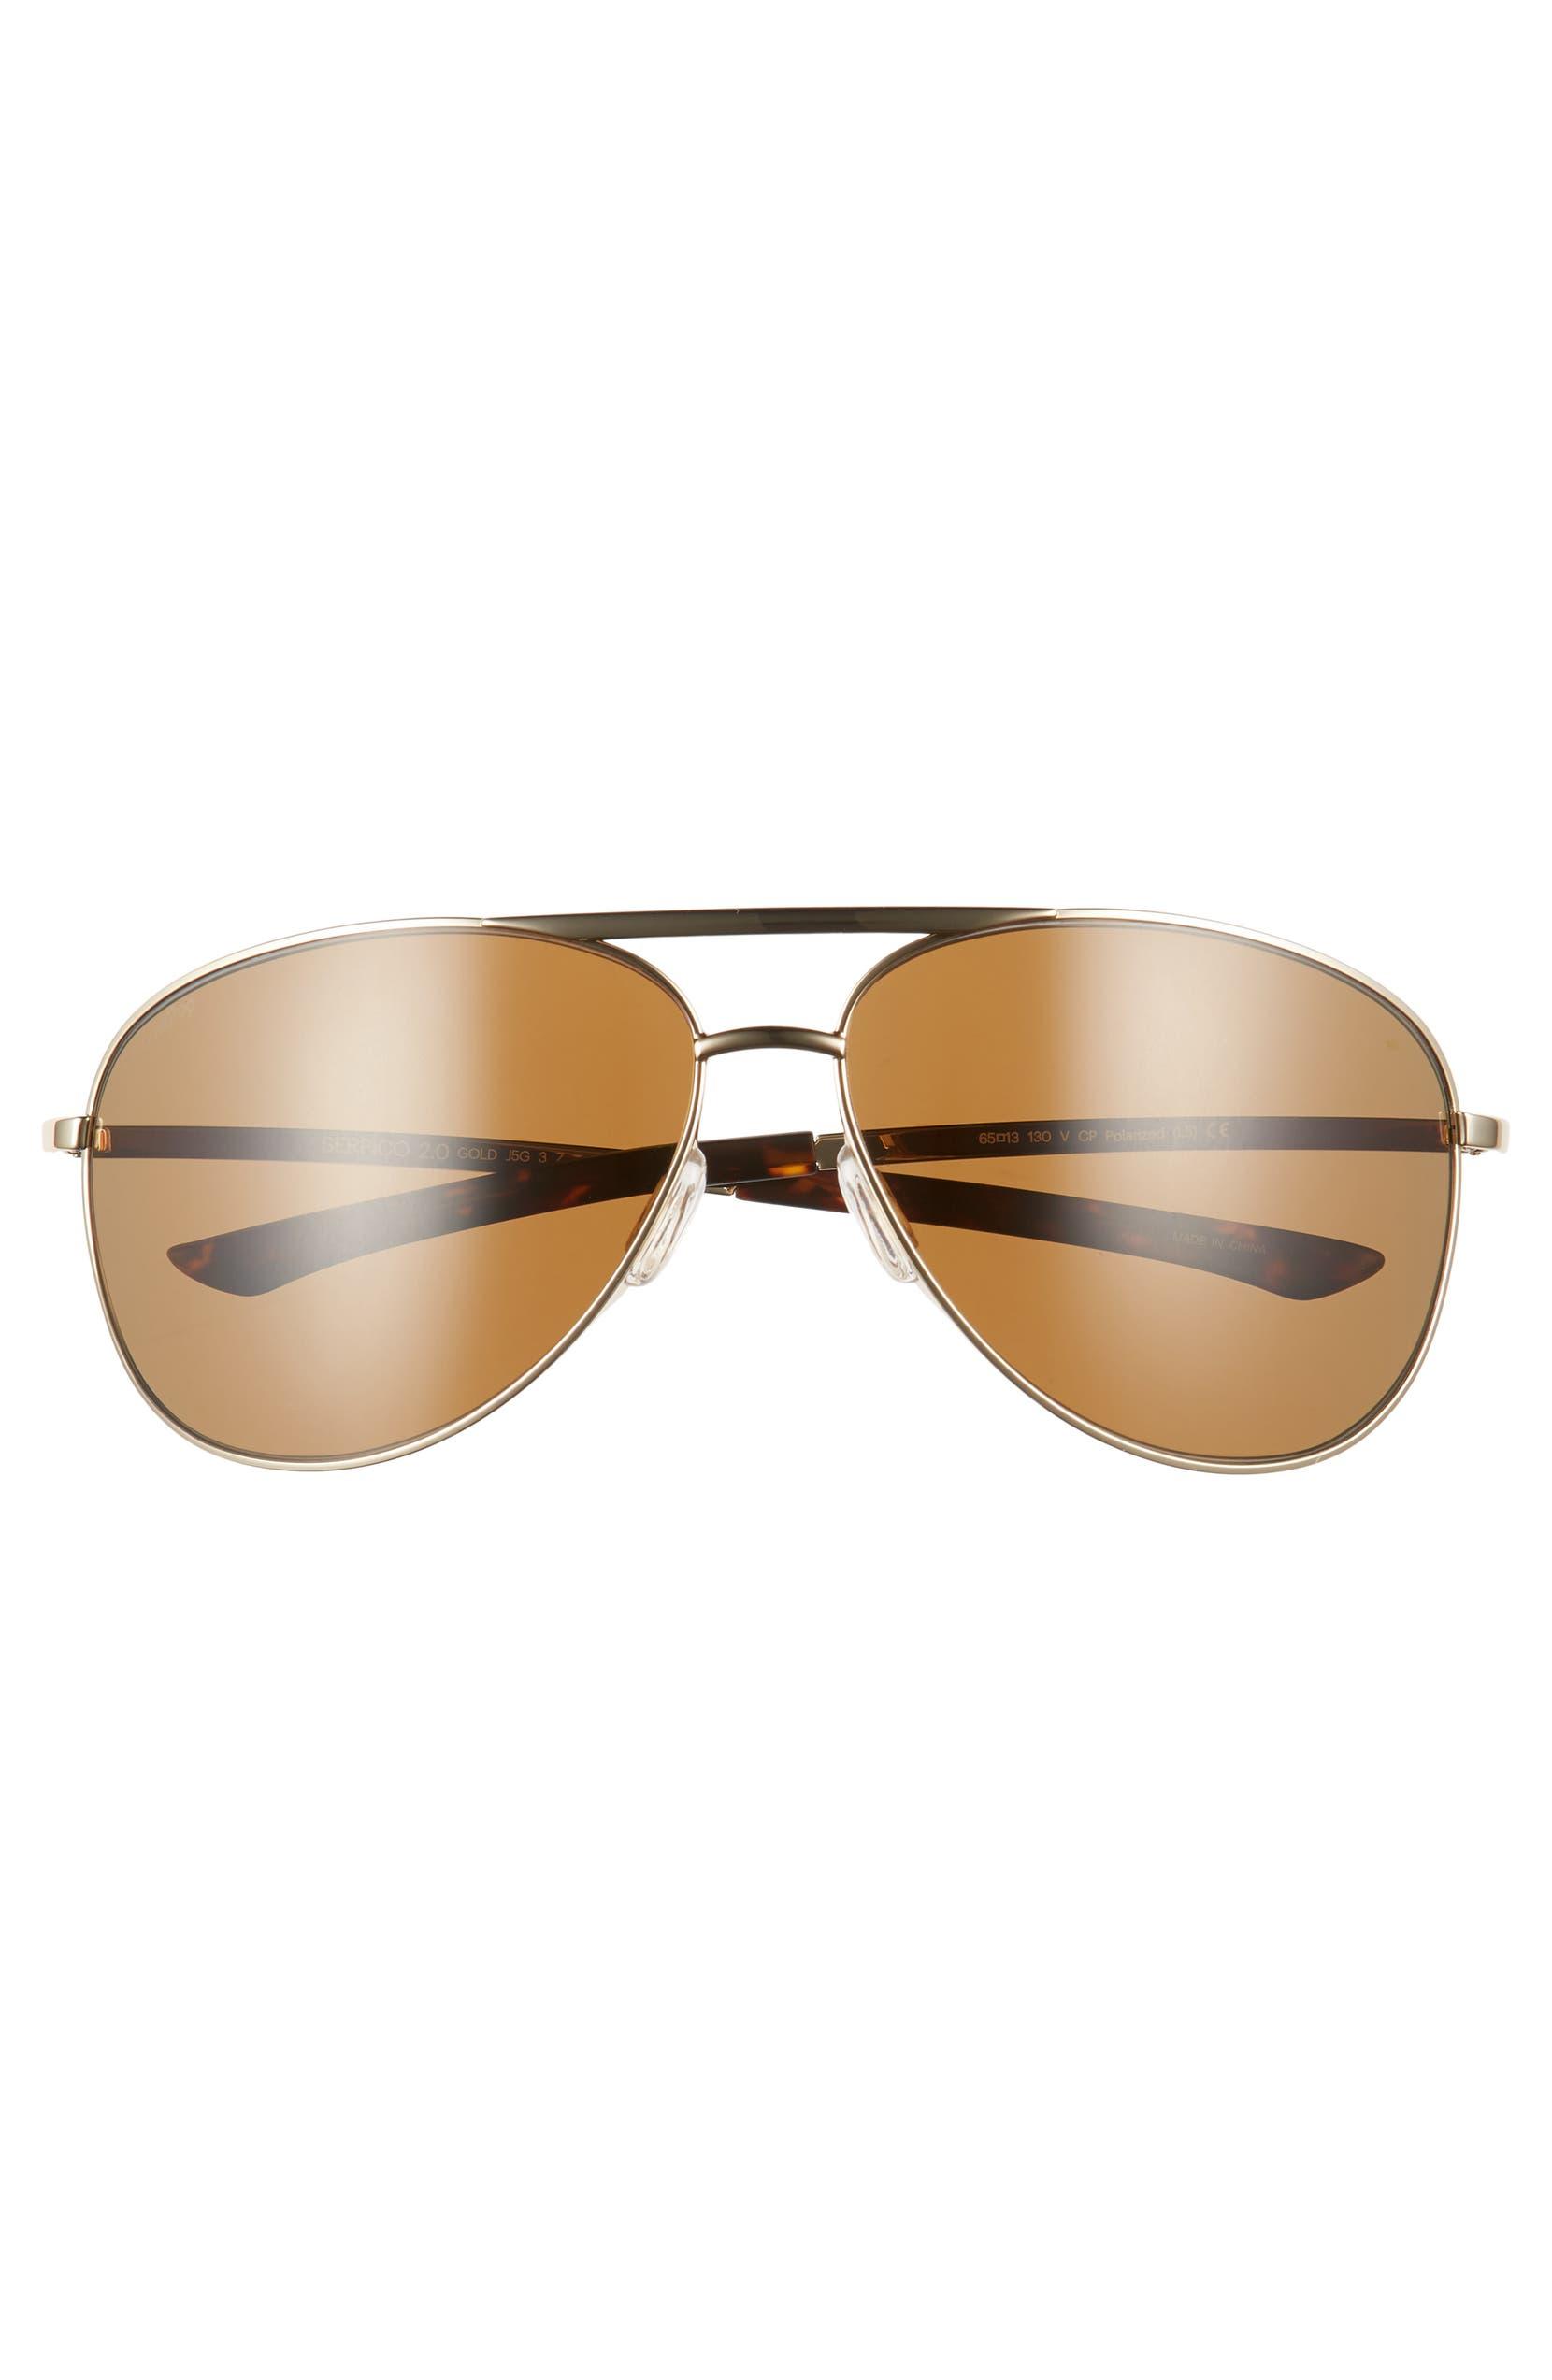 a18131ad883 Smith Serpico Slim 2.0 65mm ChromaPop™ Polarized Aviator Sunglasses ...